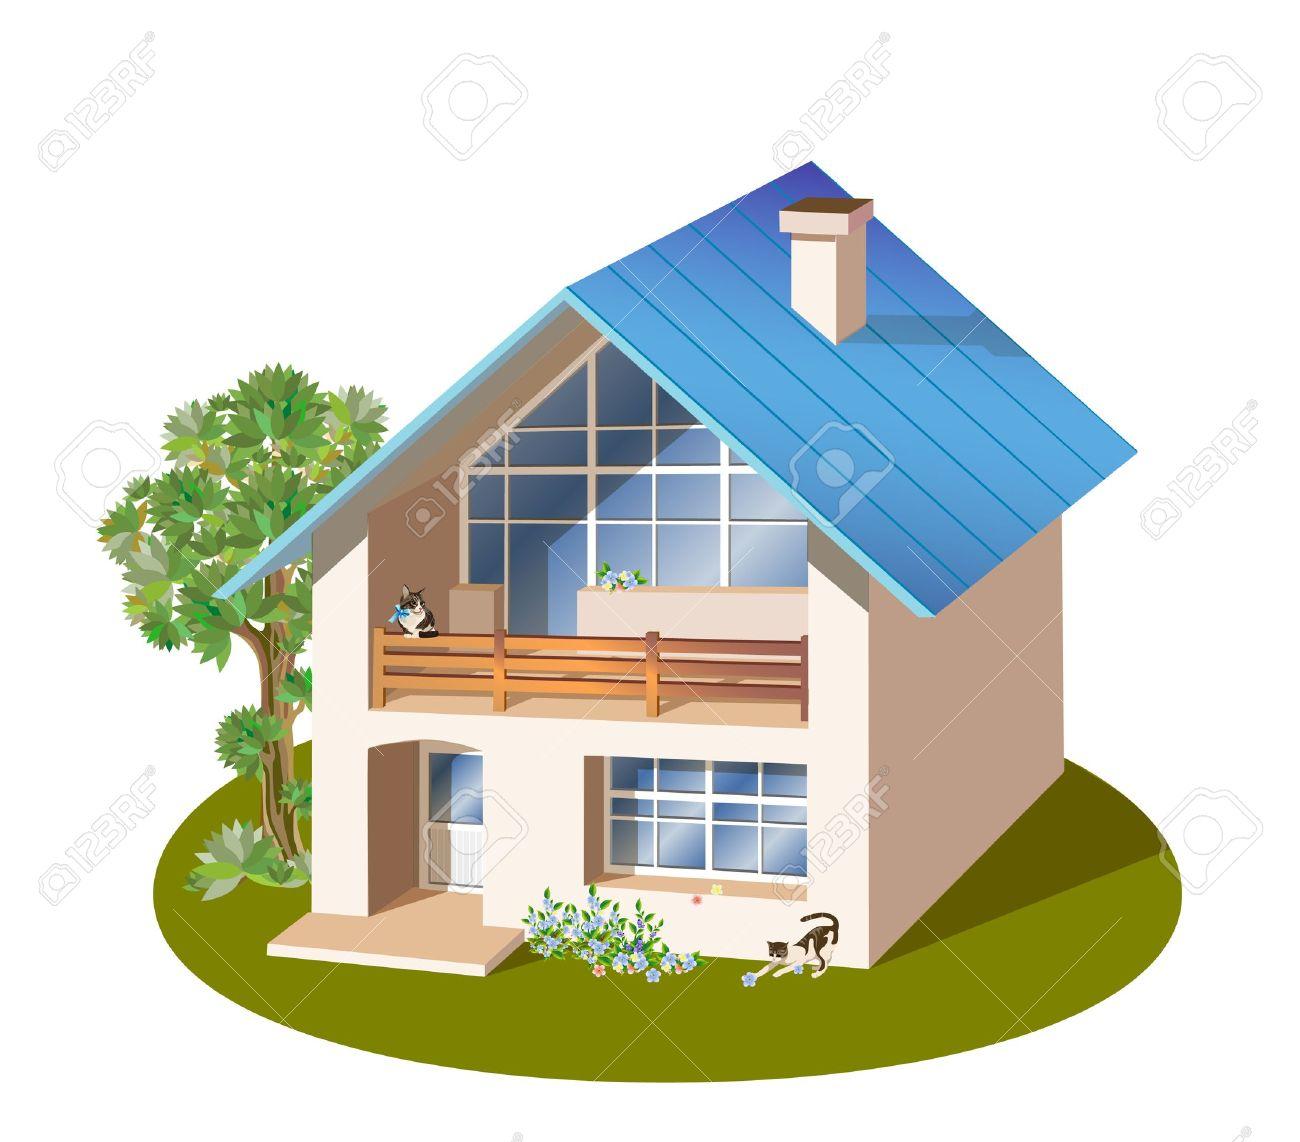 Cottage clipart home and family House Vila house family vila